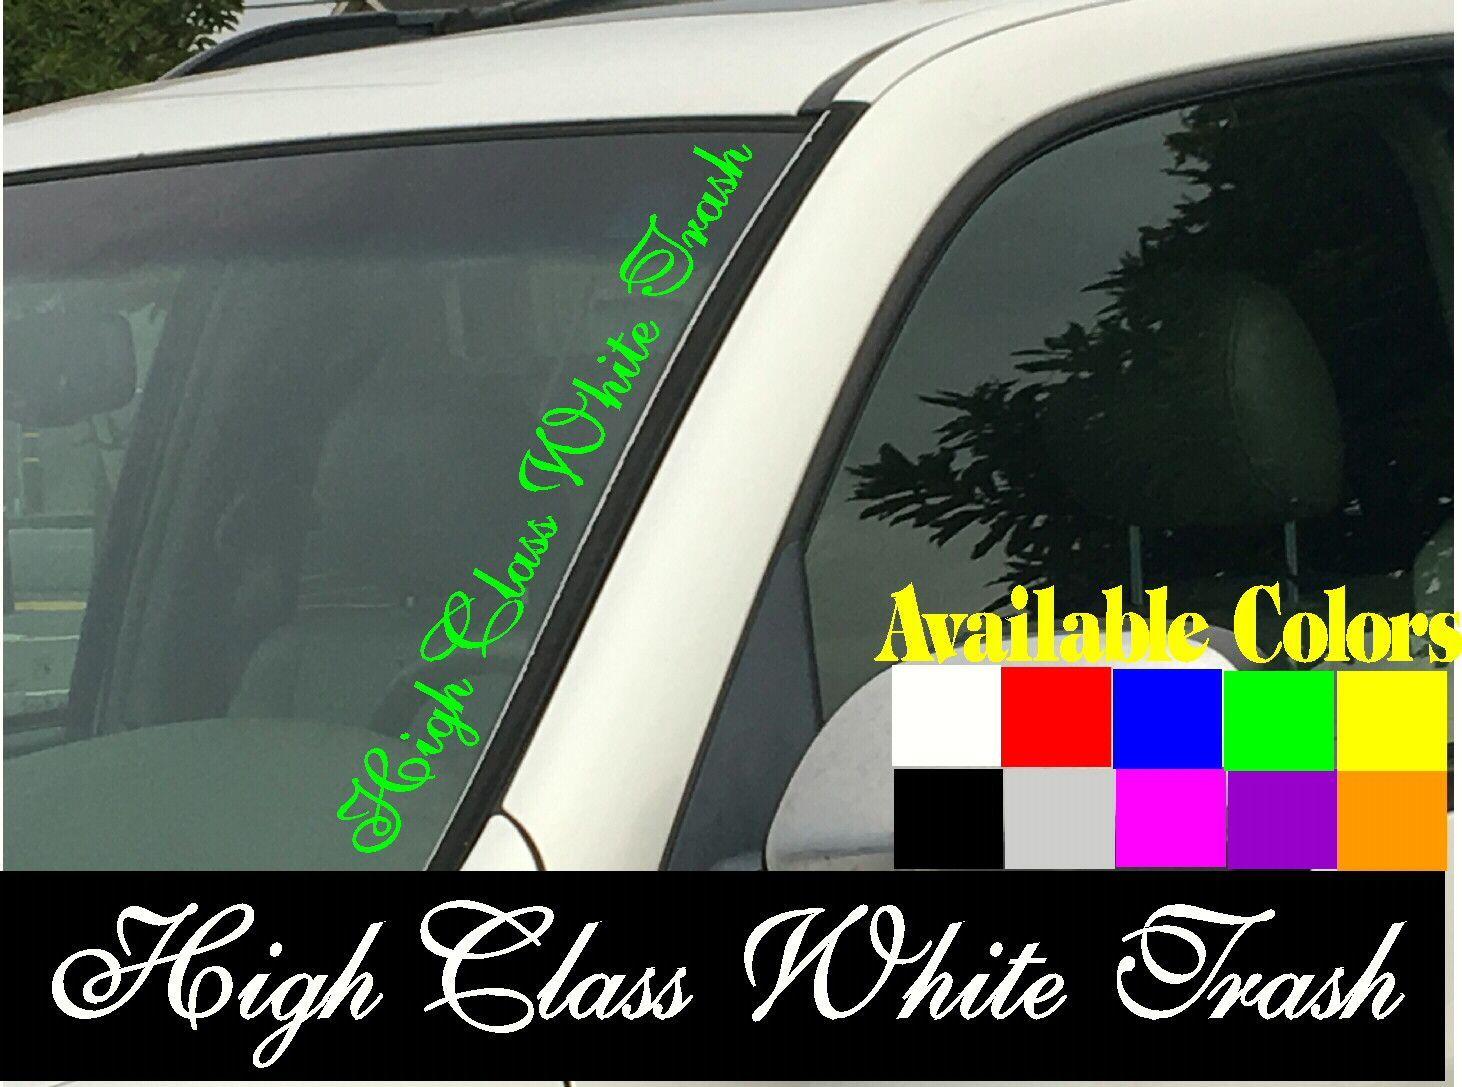 Class White Trash Vertical Windshield Die Cut Vinyl Decal Sticker - Die cut vinyl decal stickers